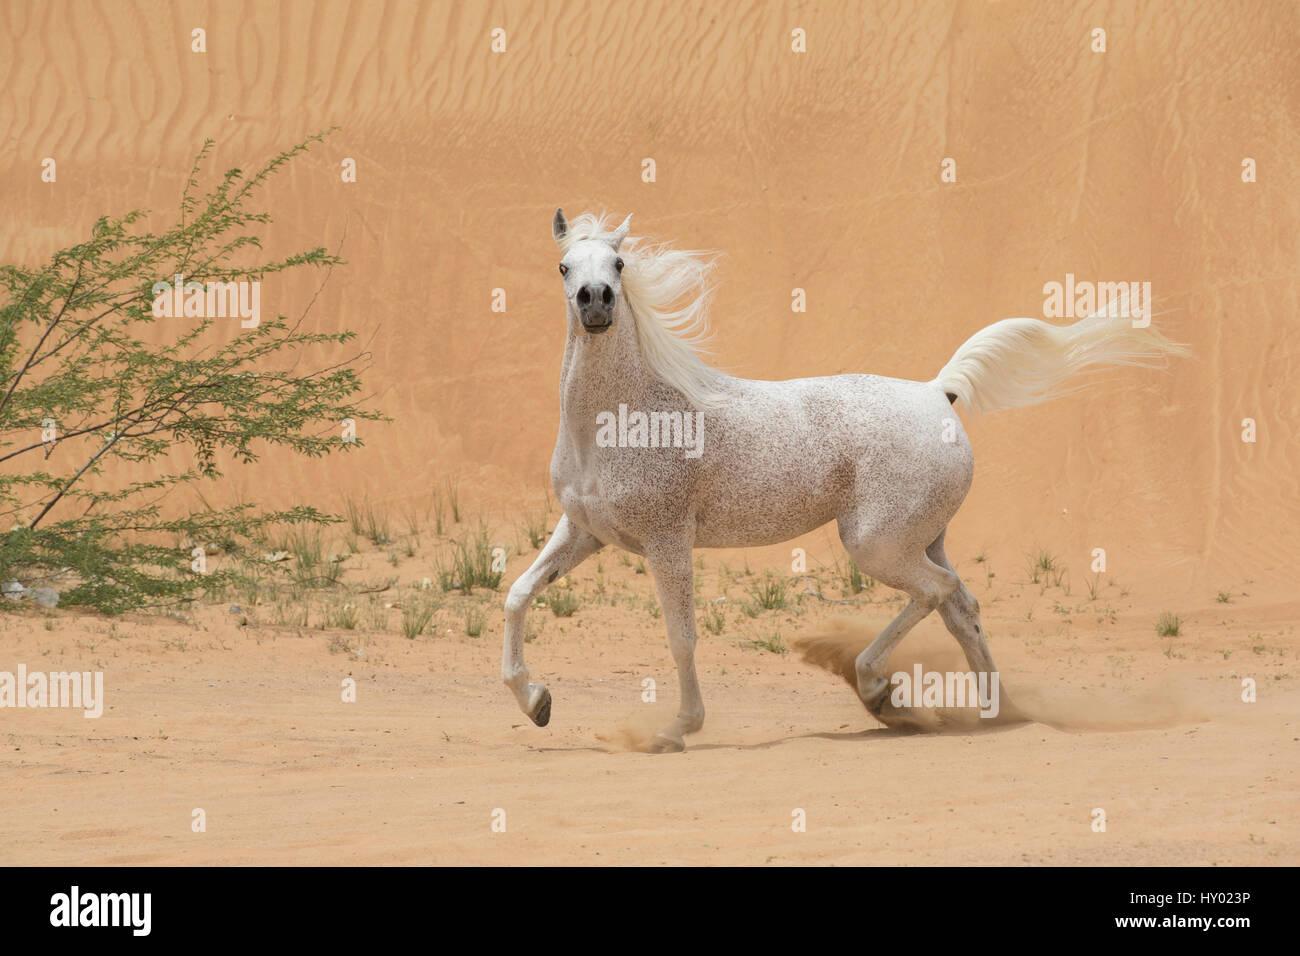 Gris semental Arabain trote en dunas del desierto cerca de Dubai, Emiratos Árabes Unidos. Imagen De Stock